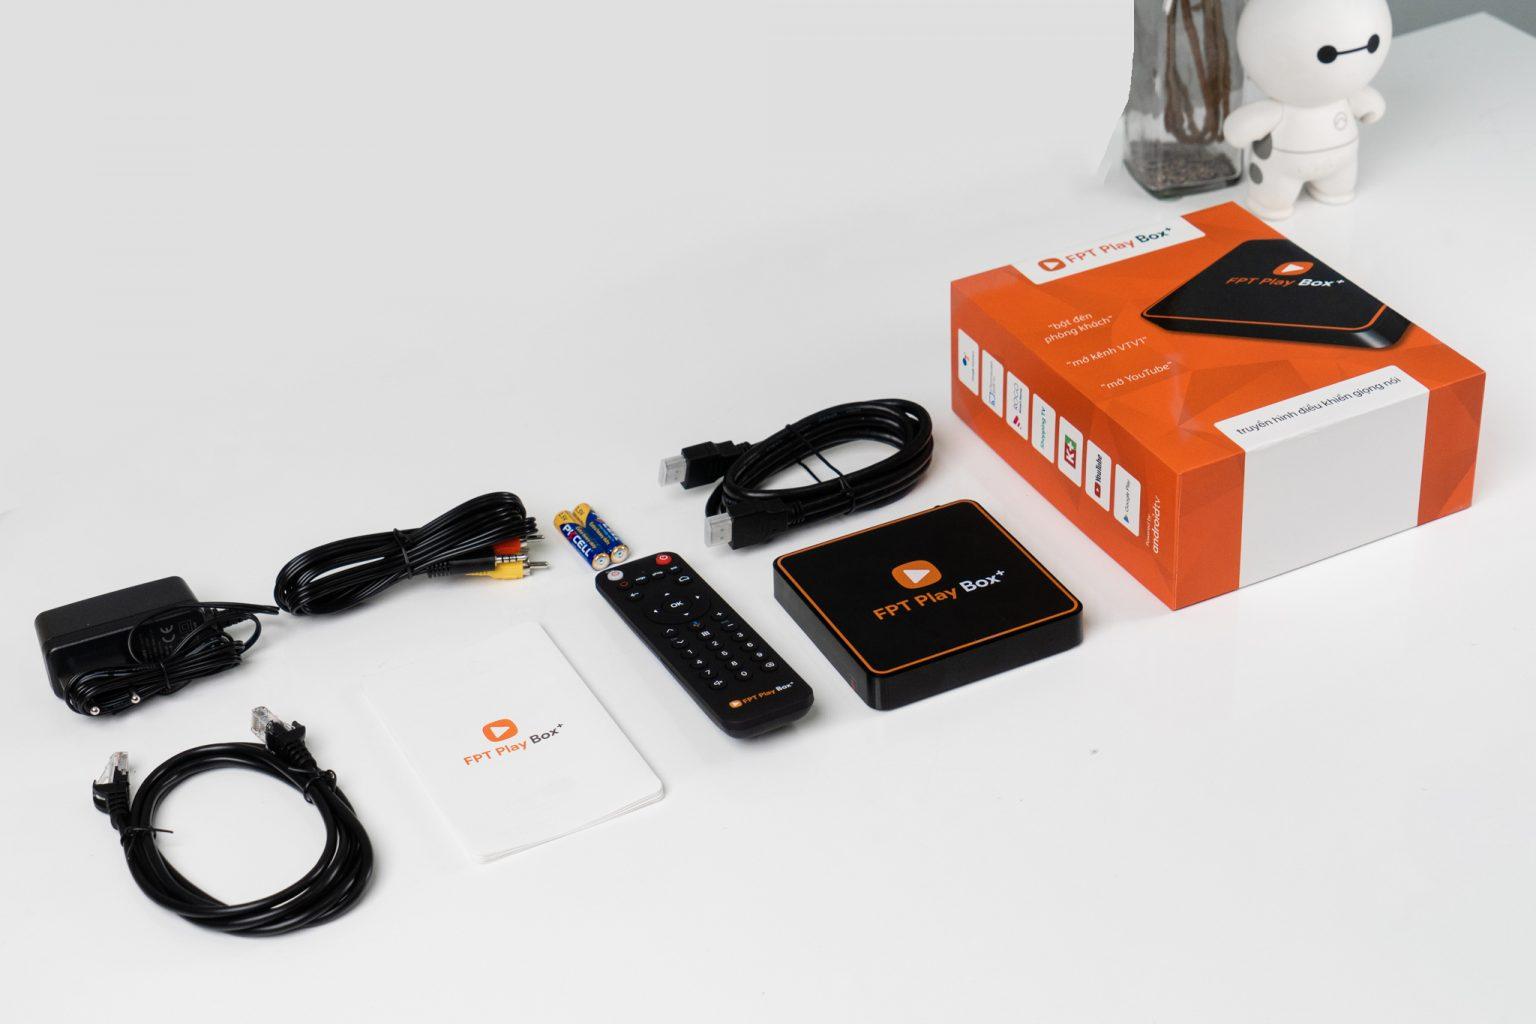 FPT Play BOX+ 2020 (S550) Ram 2G Tại FPT Bến Tre Full BOX